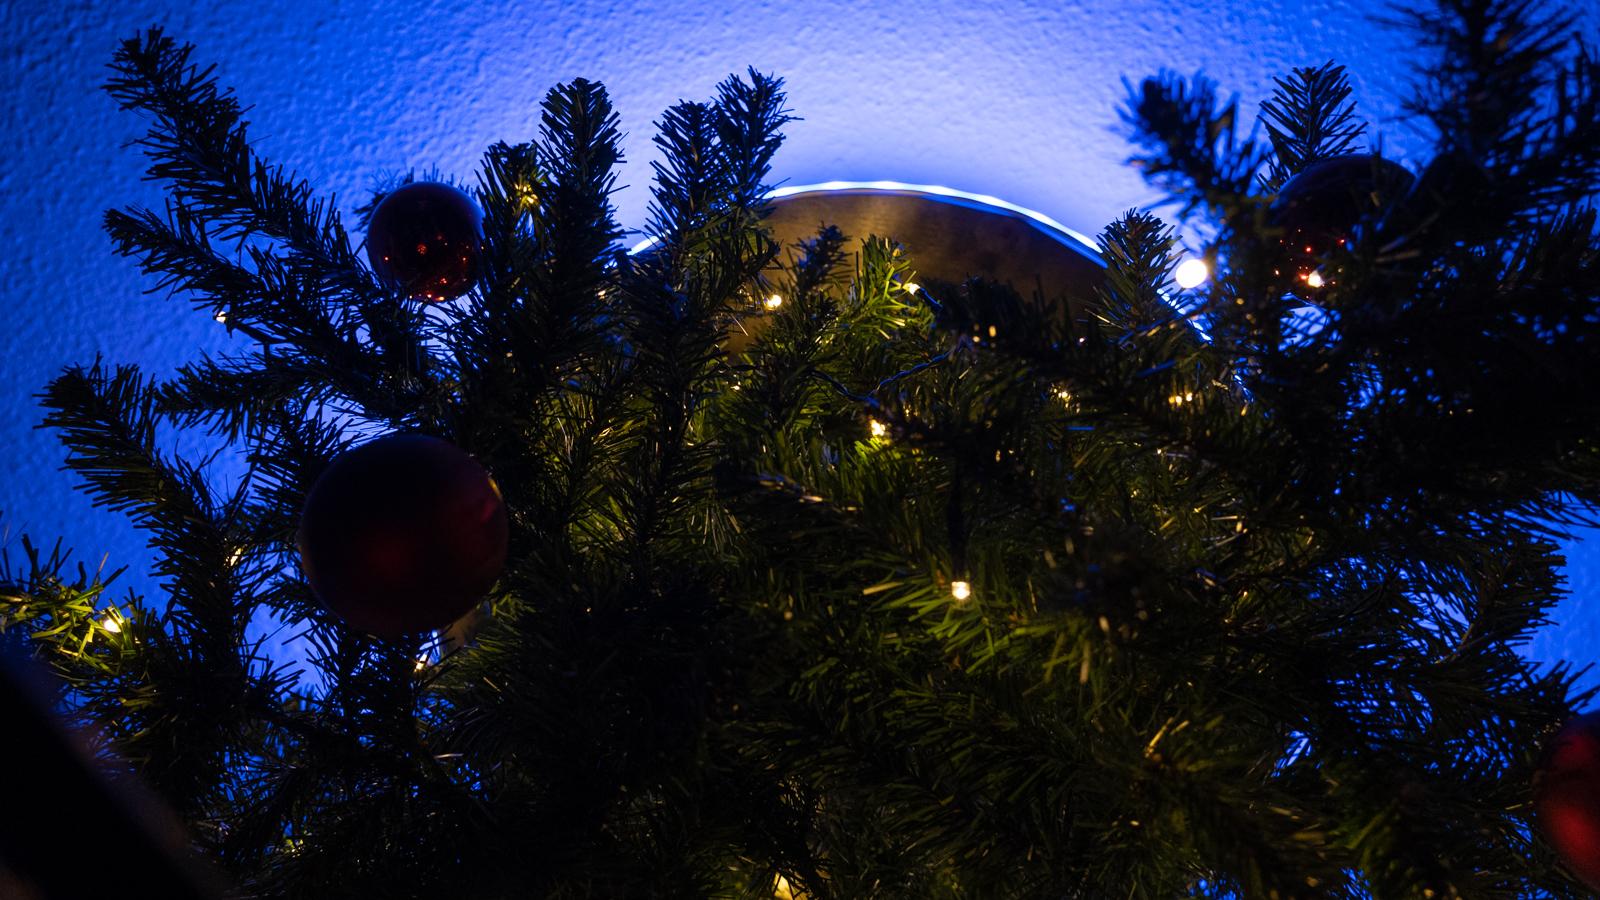 portal_tree-8.jpg